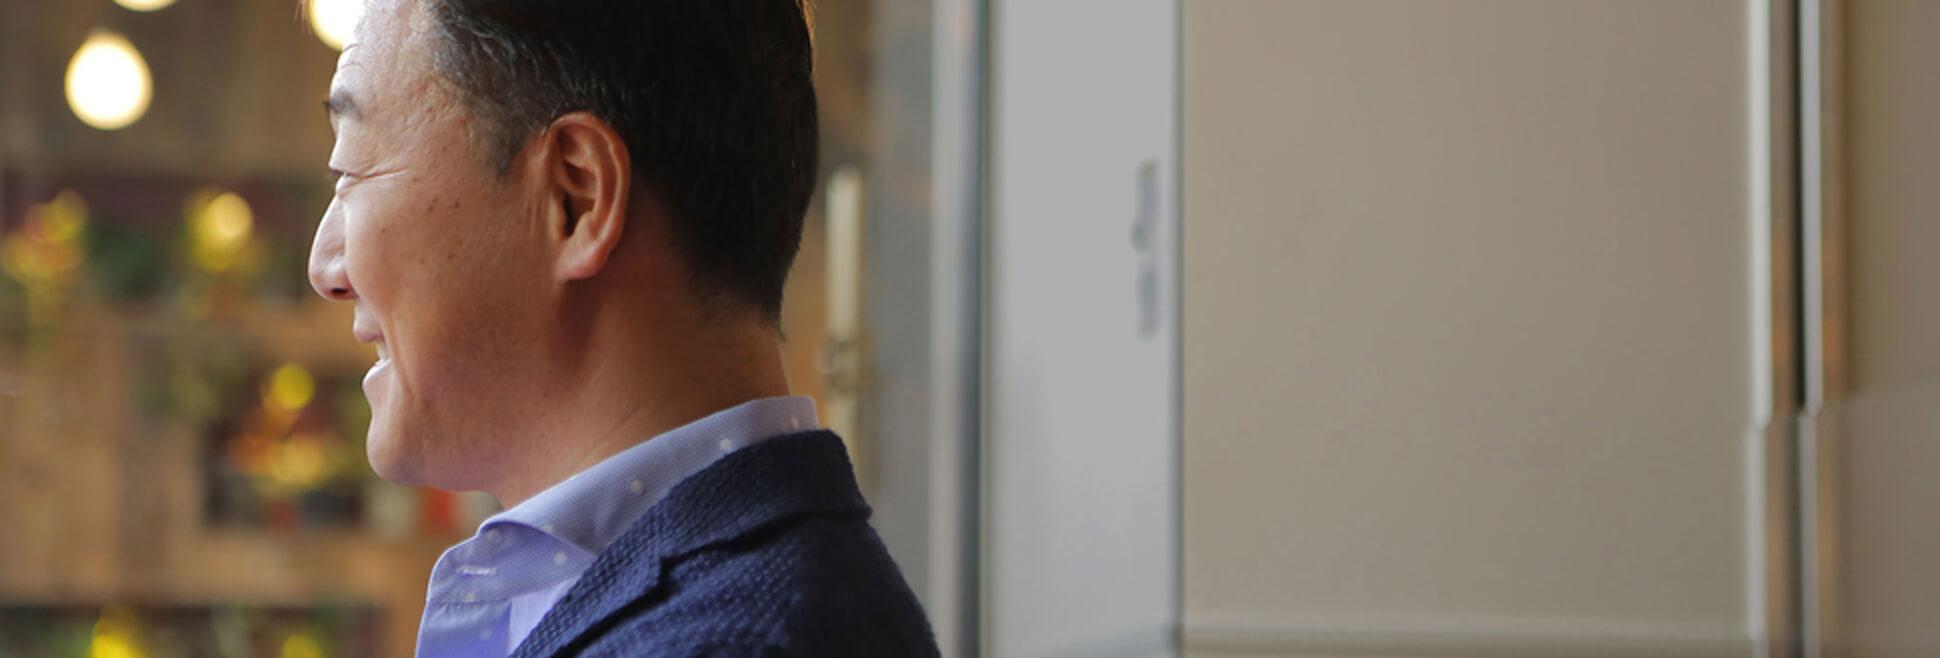 株式会社HUGE CEO 新川 義弘